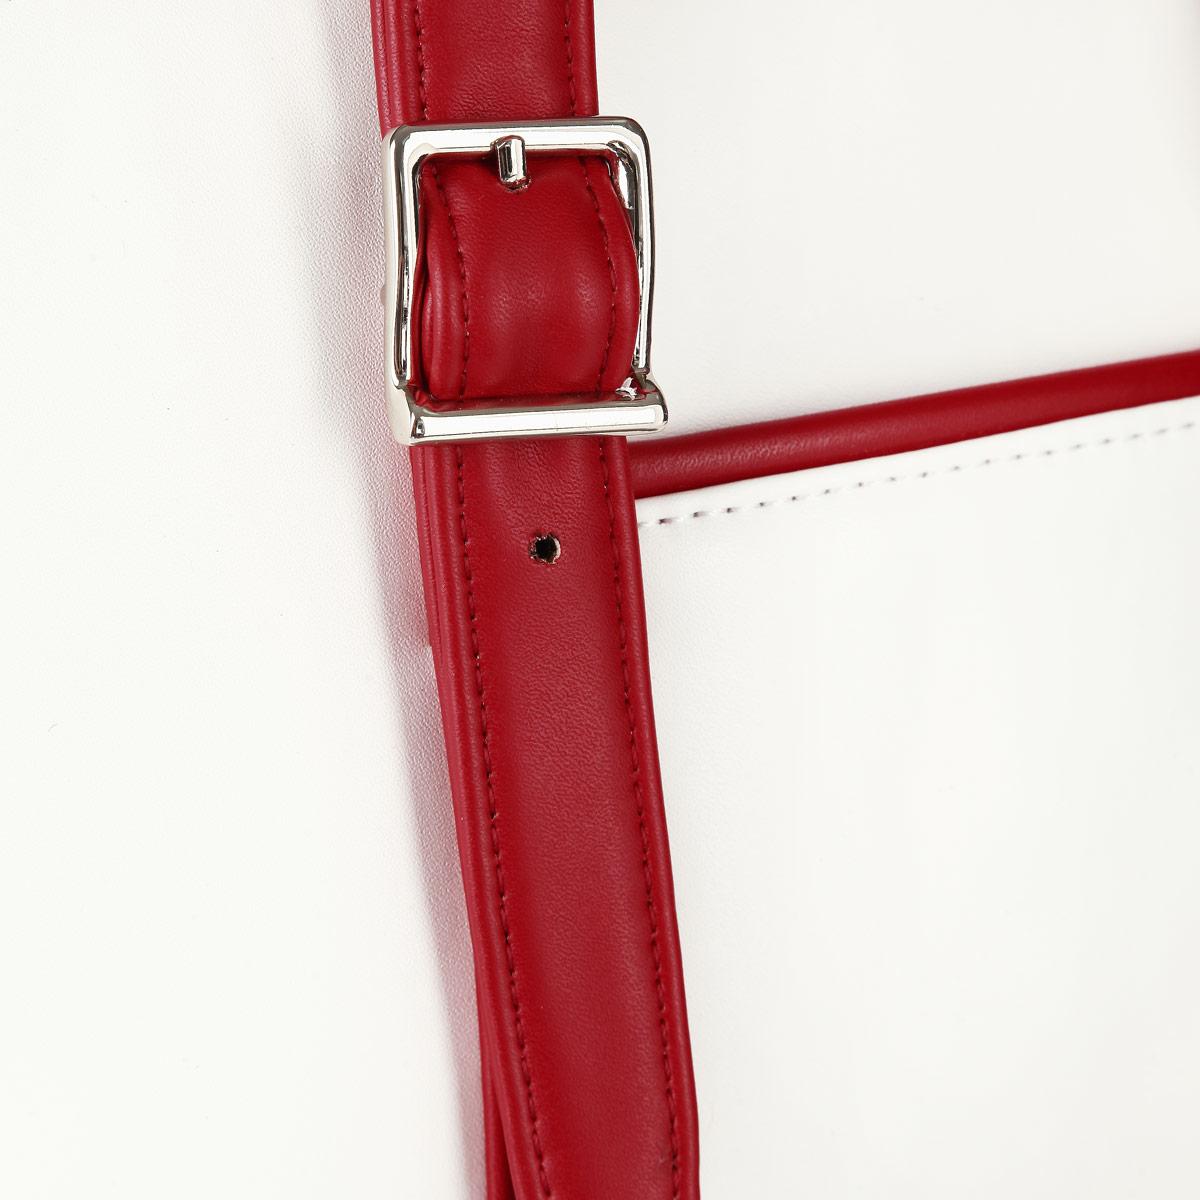 Сумка женская Leighton, цвет: белый, красный. 550265-082 ( 550265-082/101/082/22 бел )